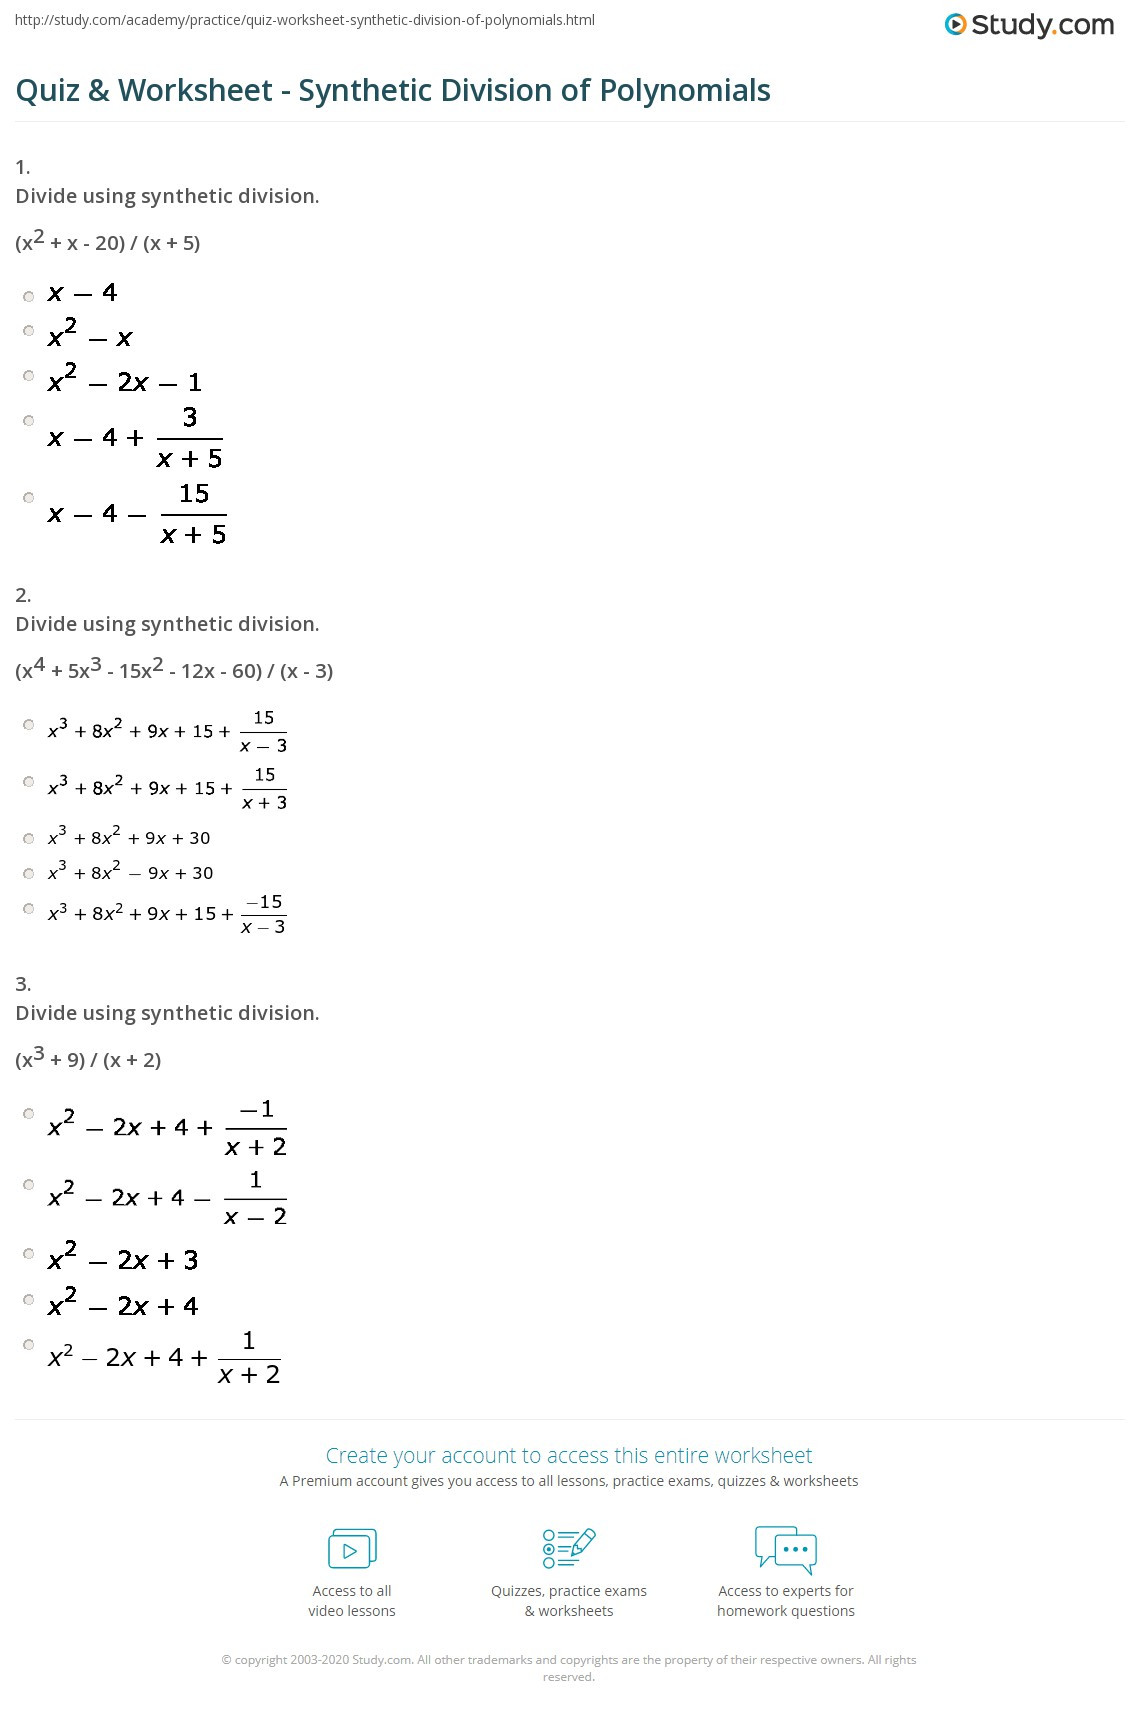 Polynomial Long Division Worksheet Quiz & Worksheet Synthetic Division Of Polynomials